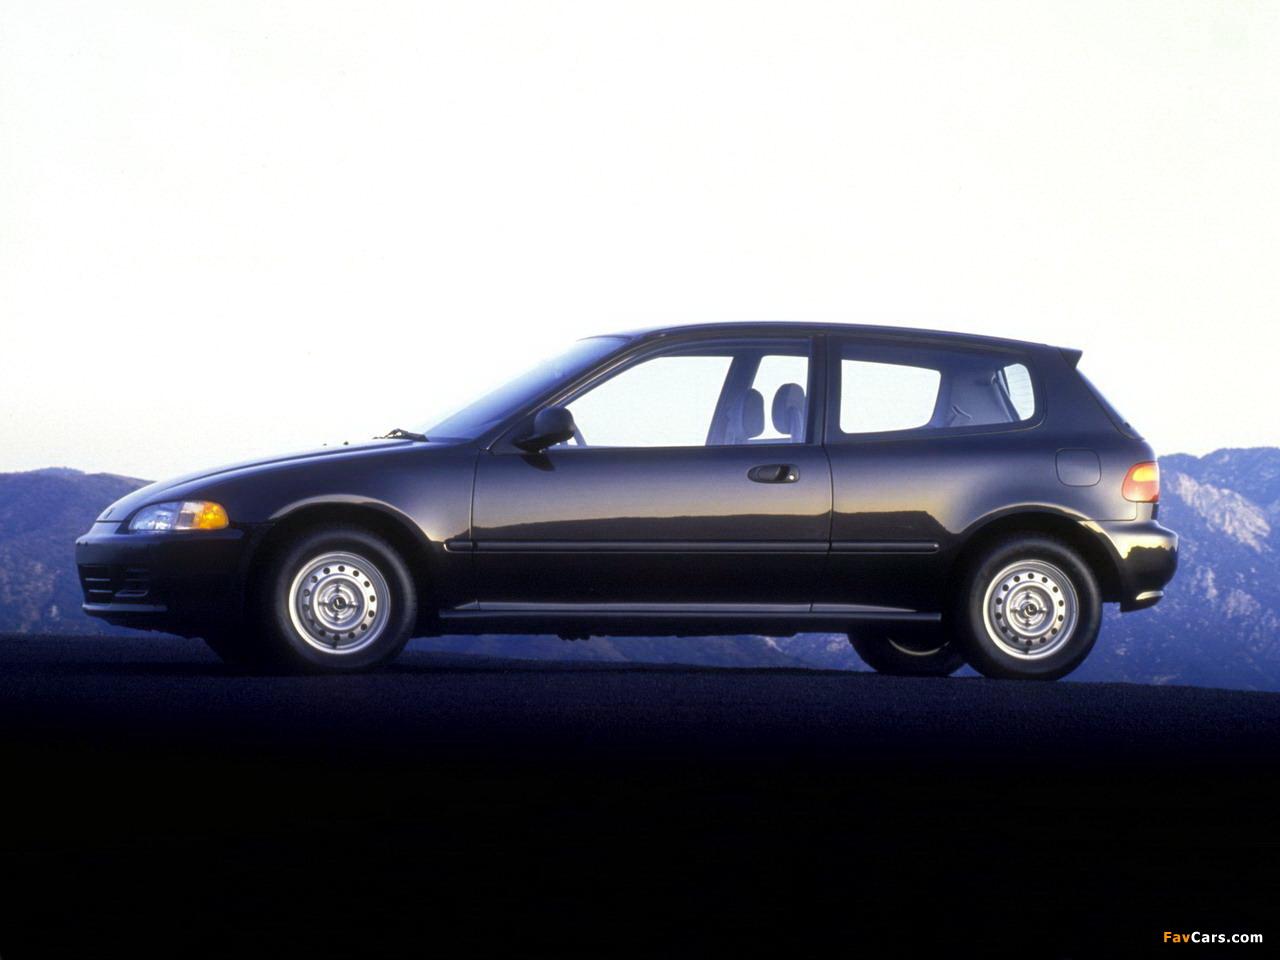 honda civic hatchback us spec eg 1991 95 images 1280x960 rh favcars com